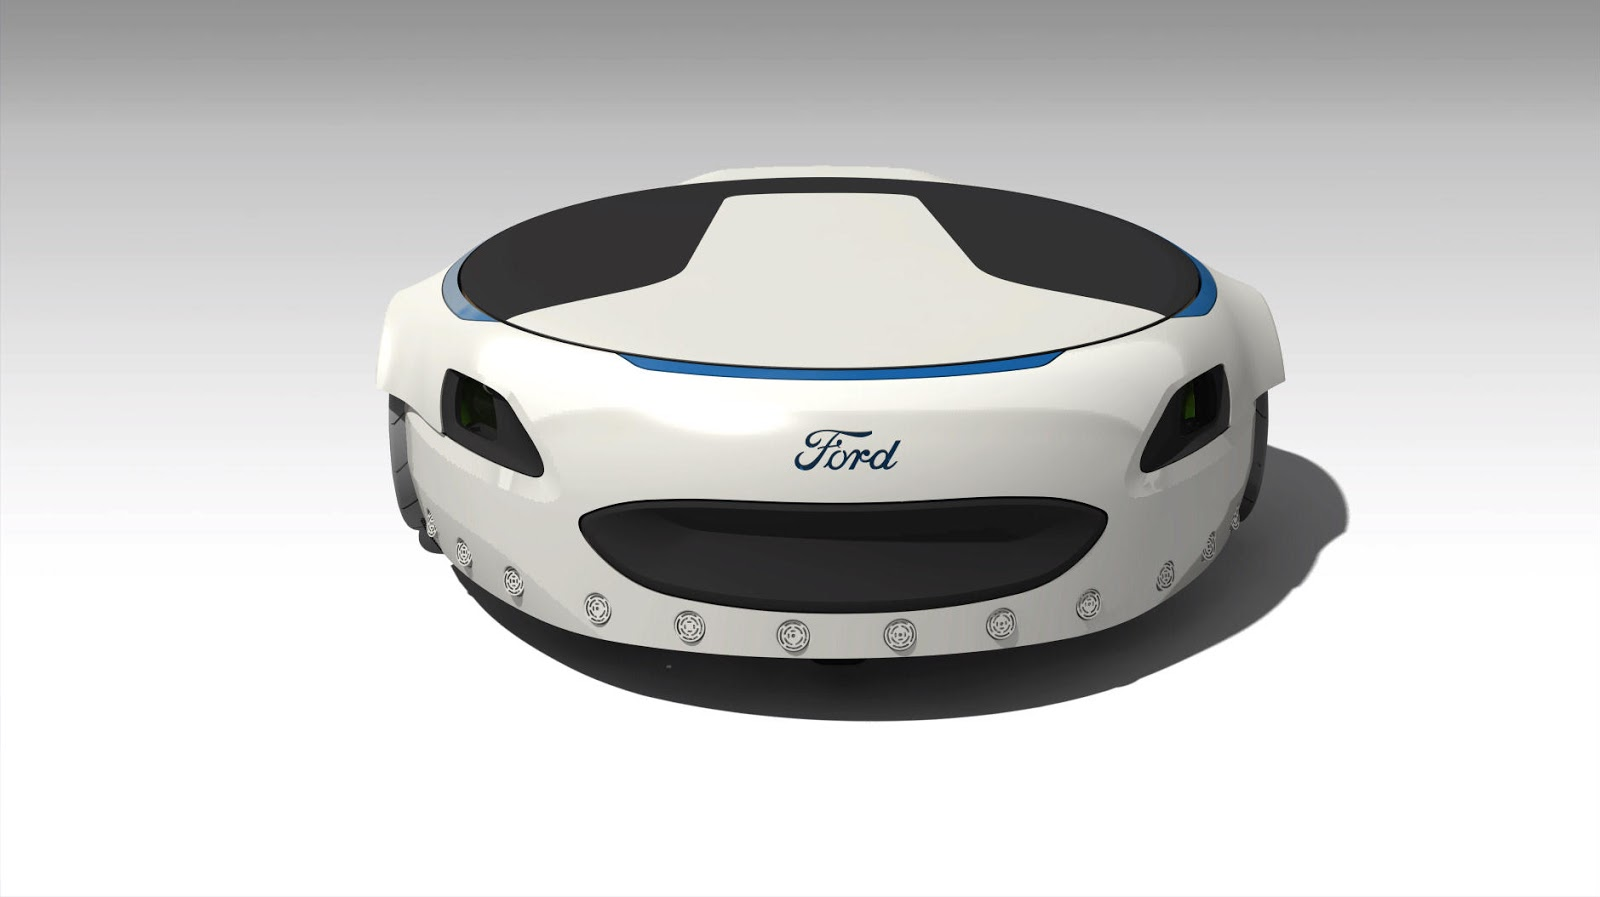 R8 Carr-E : Η ατομική πλατφόρμα μετακίνησης σε σχήμα και μέγεθος ρεζέρβας! Carr-E, Electric cars, Ford, videos, Τεχνολογία